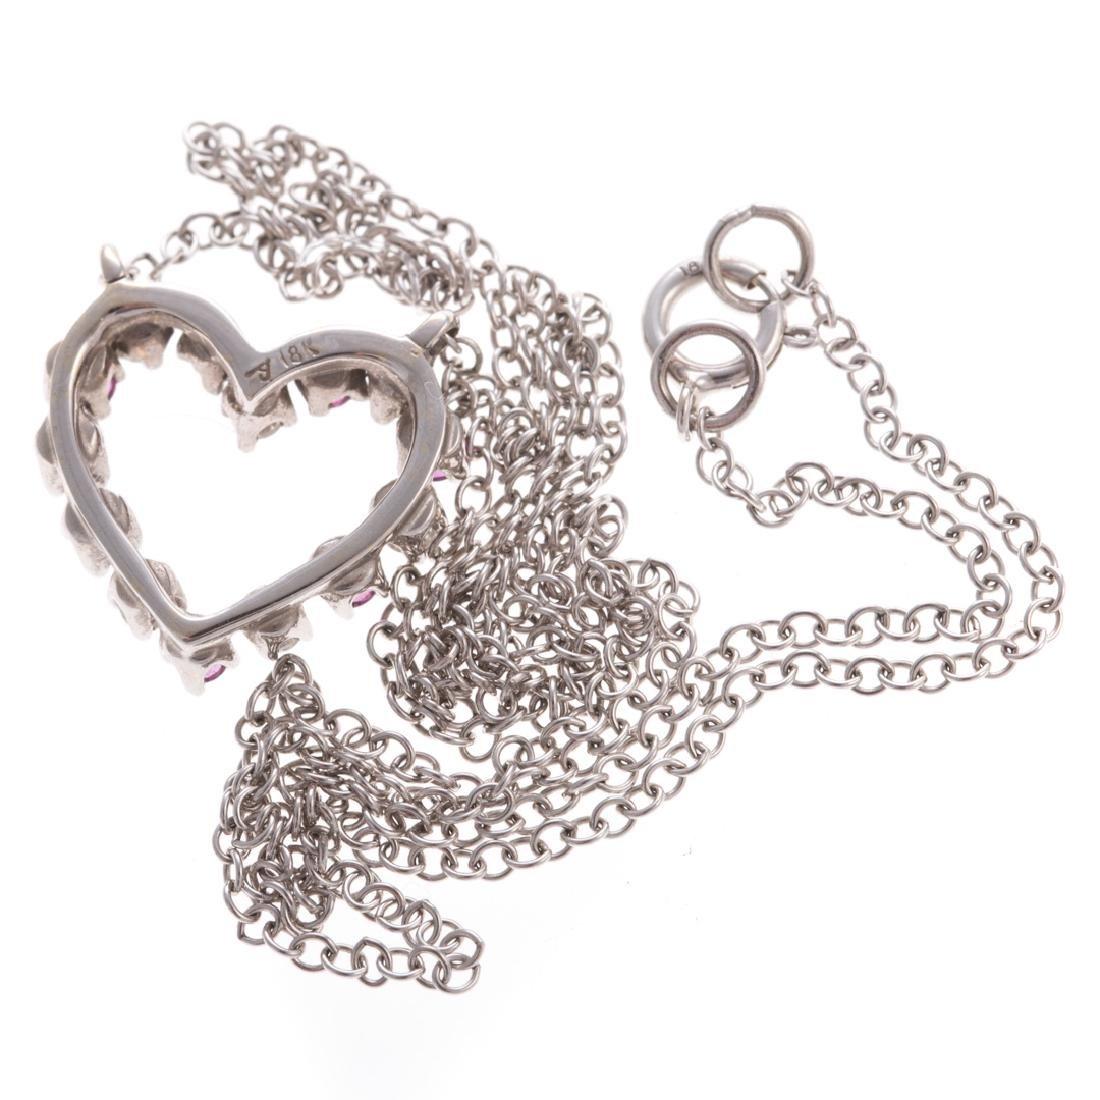 A Lady's Ruby & Diamond Heart Necklace in 18K - 3